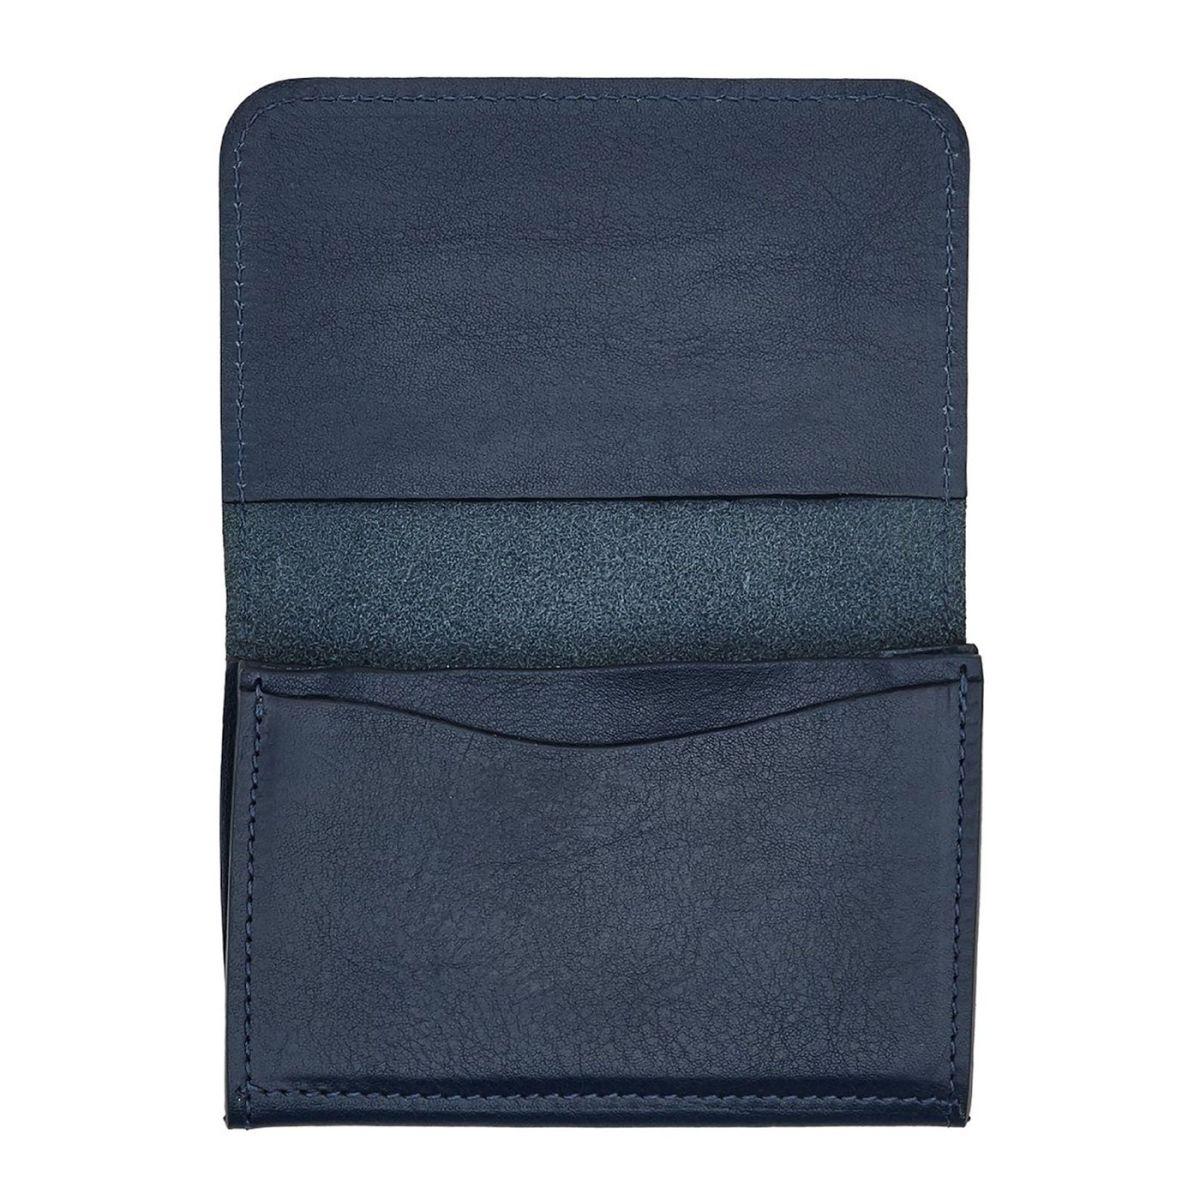 Card Case  in Cowhide Double Leather SCC004 color Blue | Details